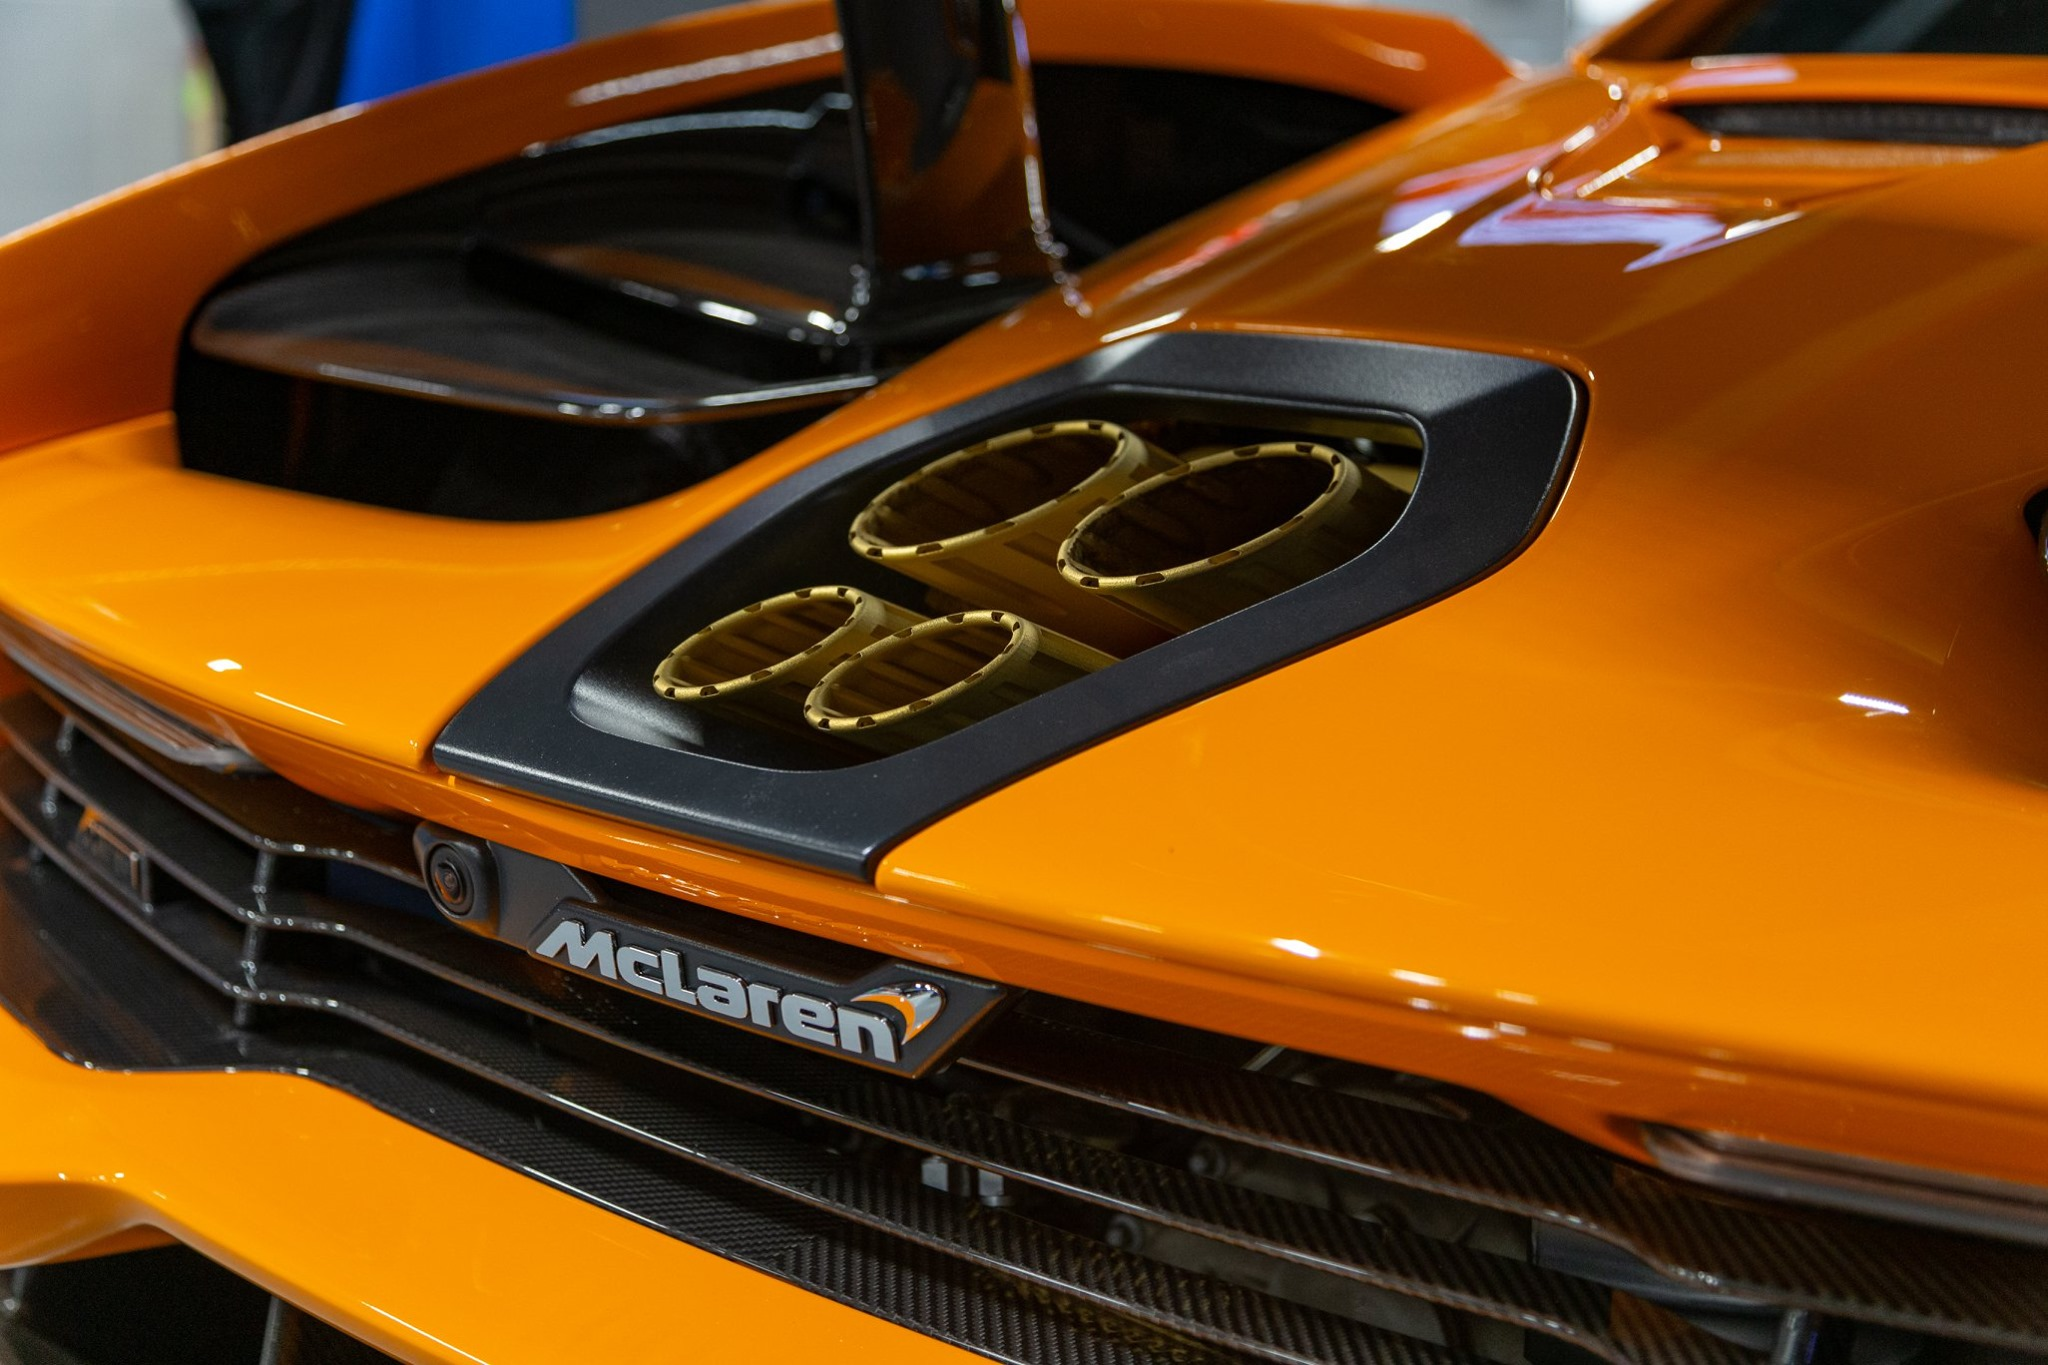 Adrian_Sutil_McLaren_Senna_LM_crash_0006